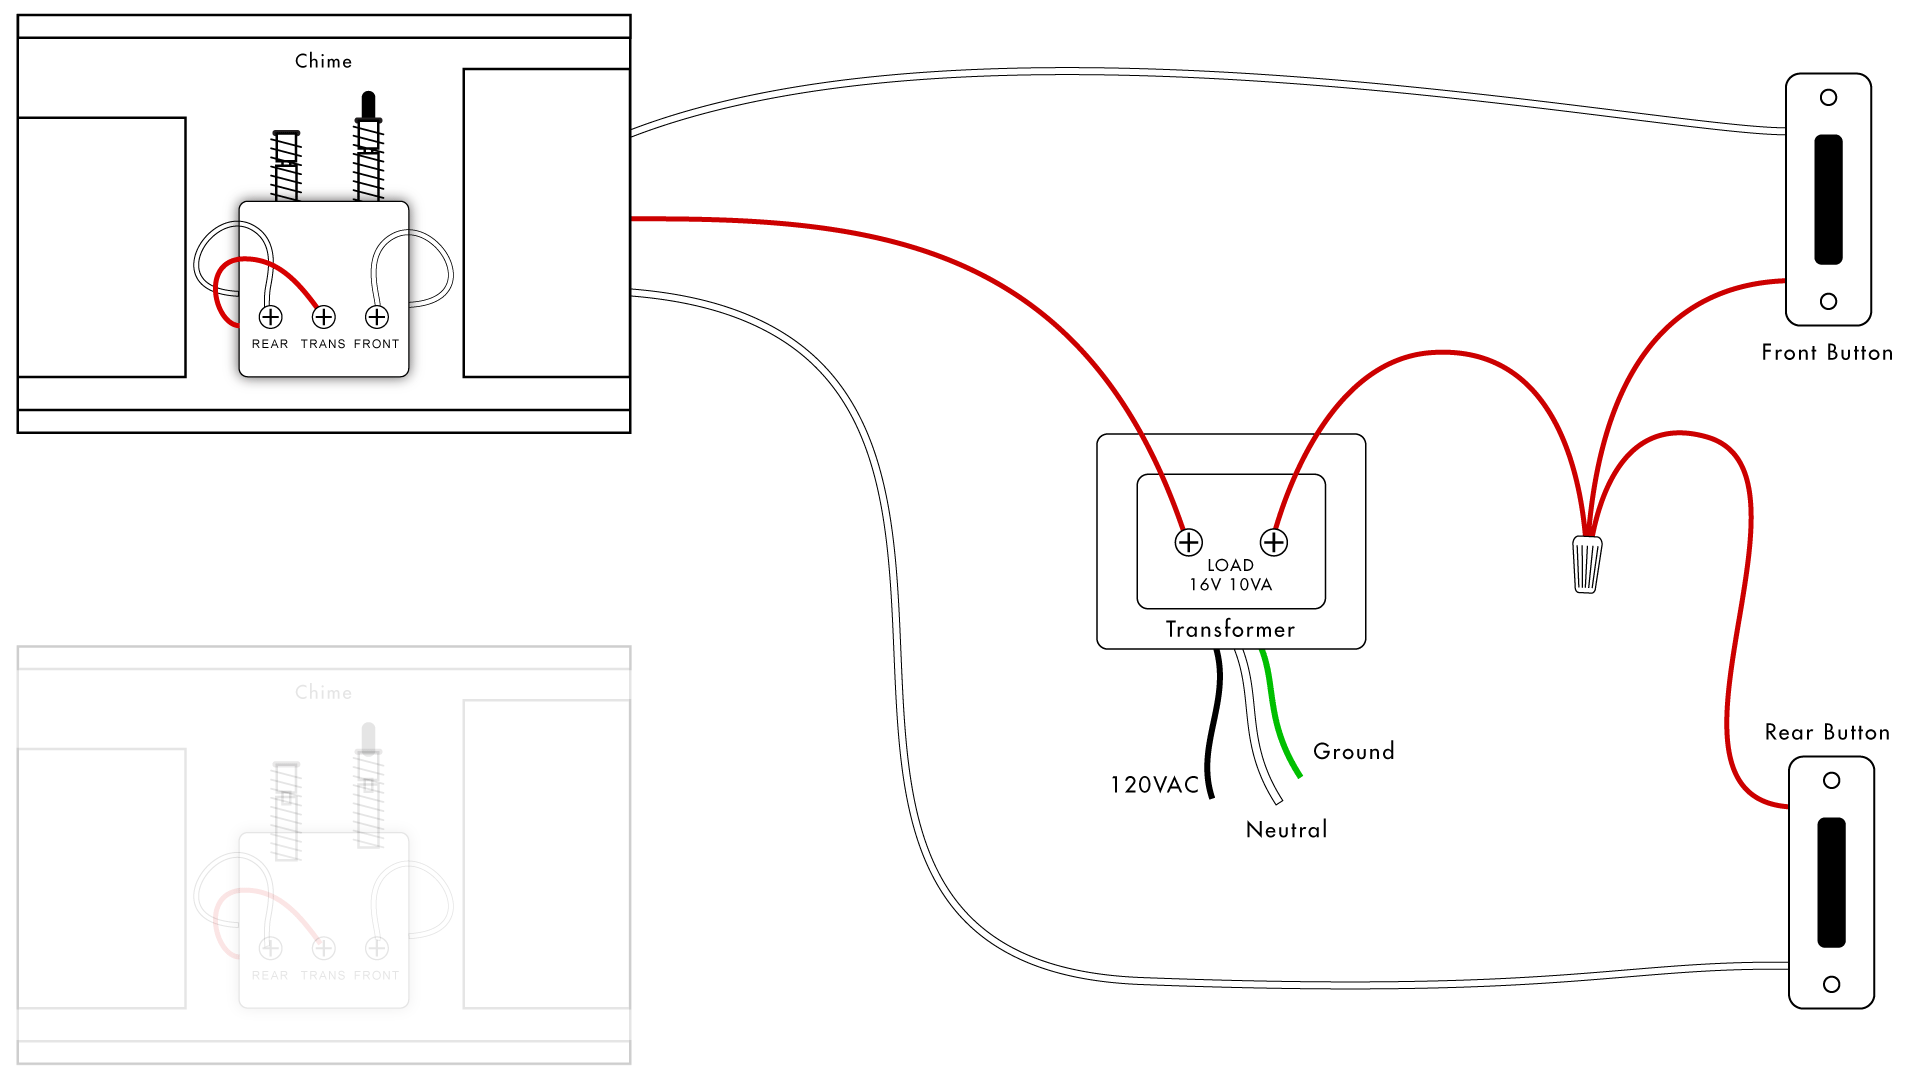 New Wiring Diagram For Bt Master Socket Diagrams